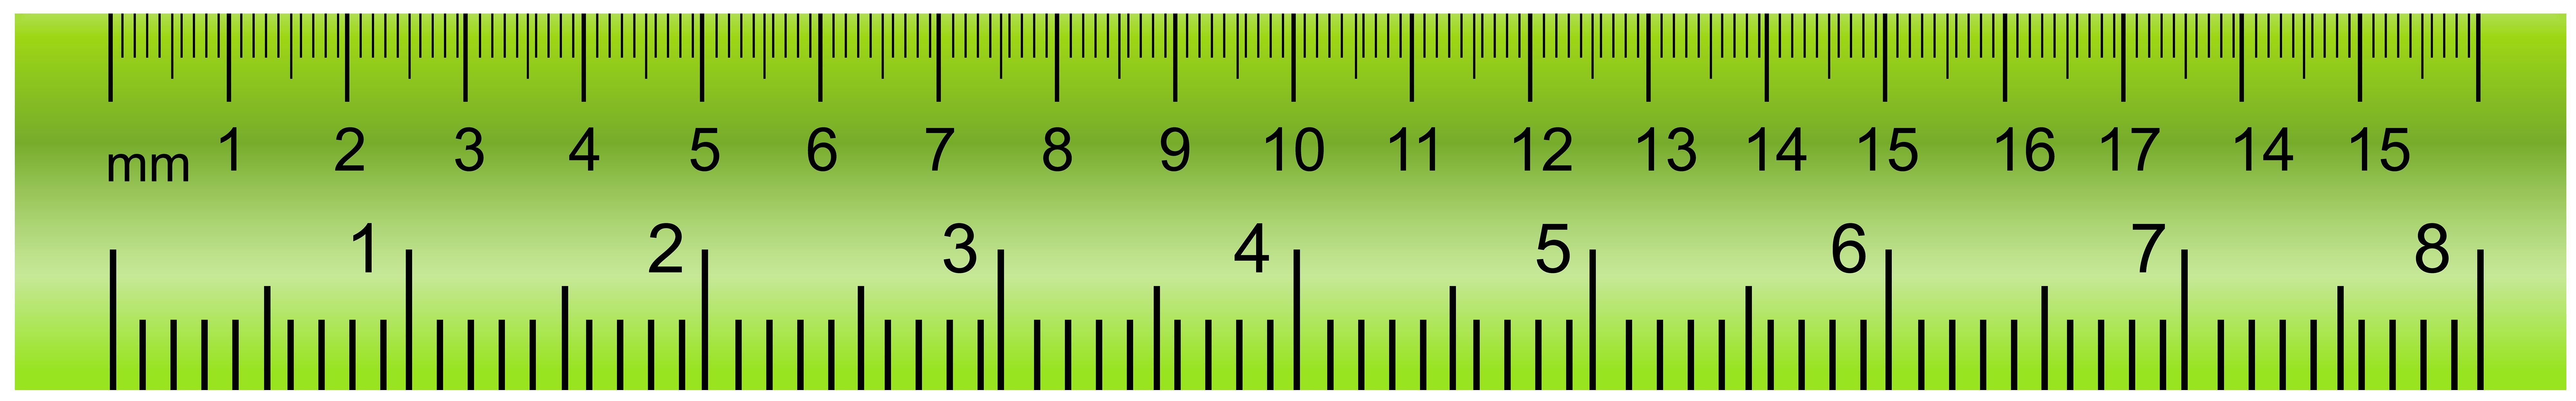 Ruler clipart. Green clip art images